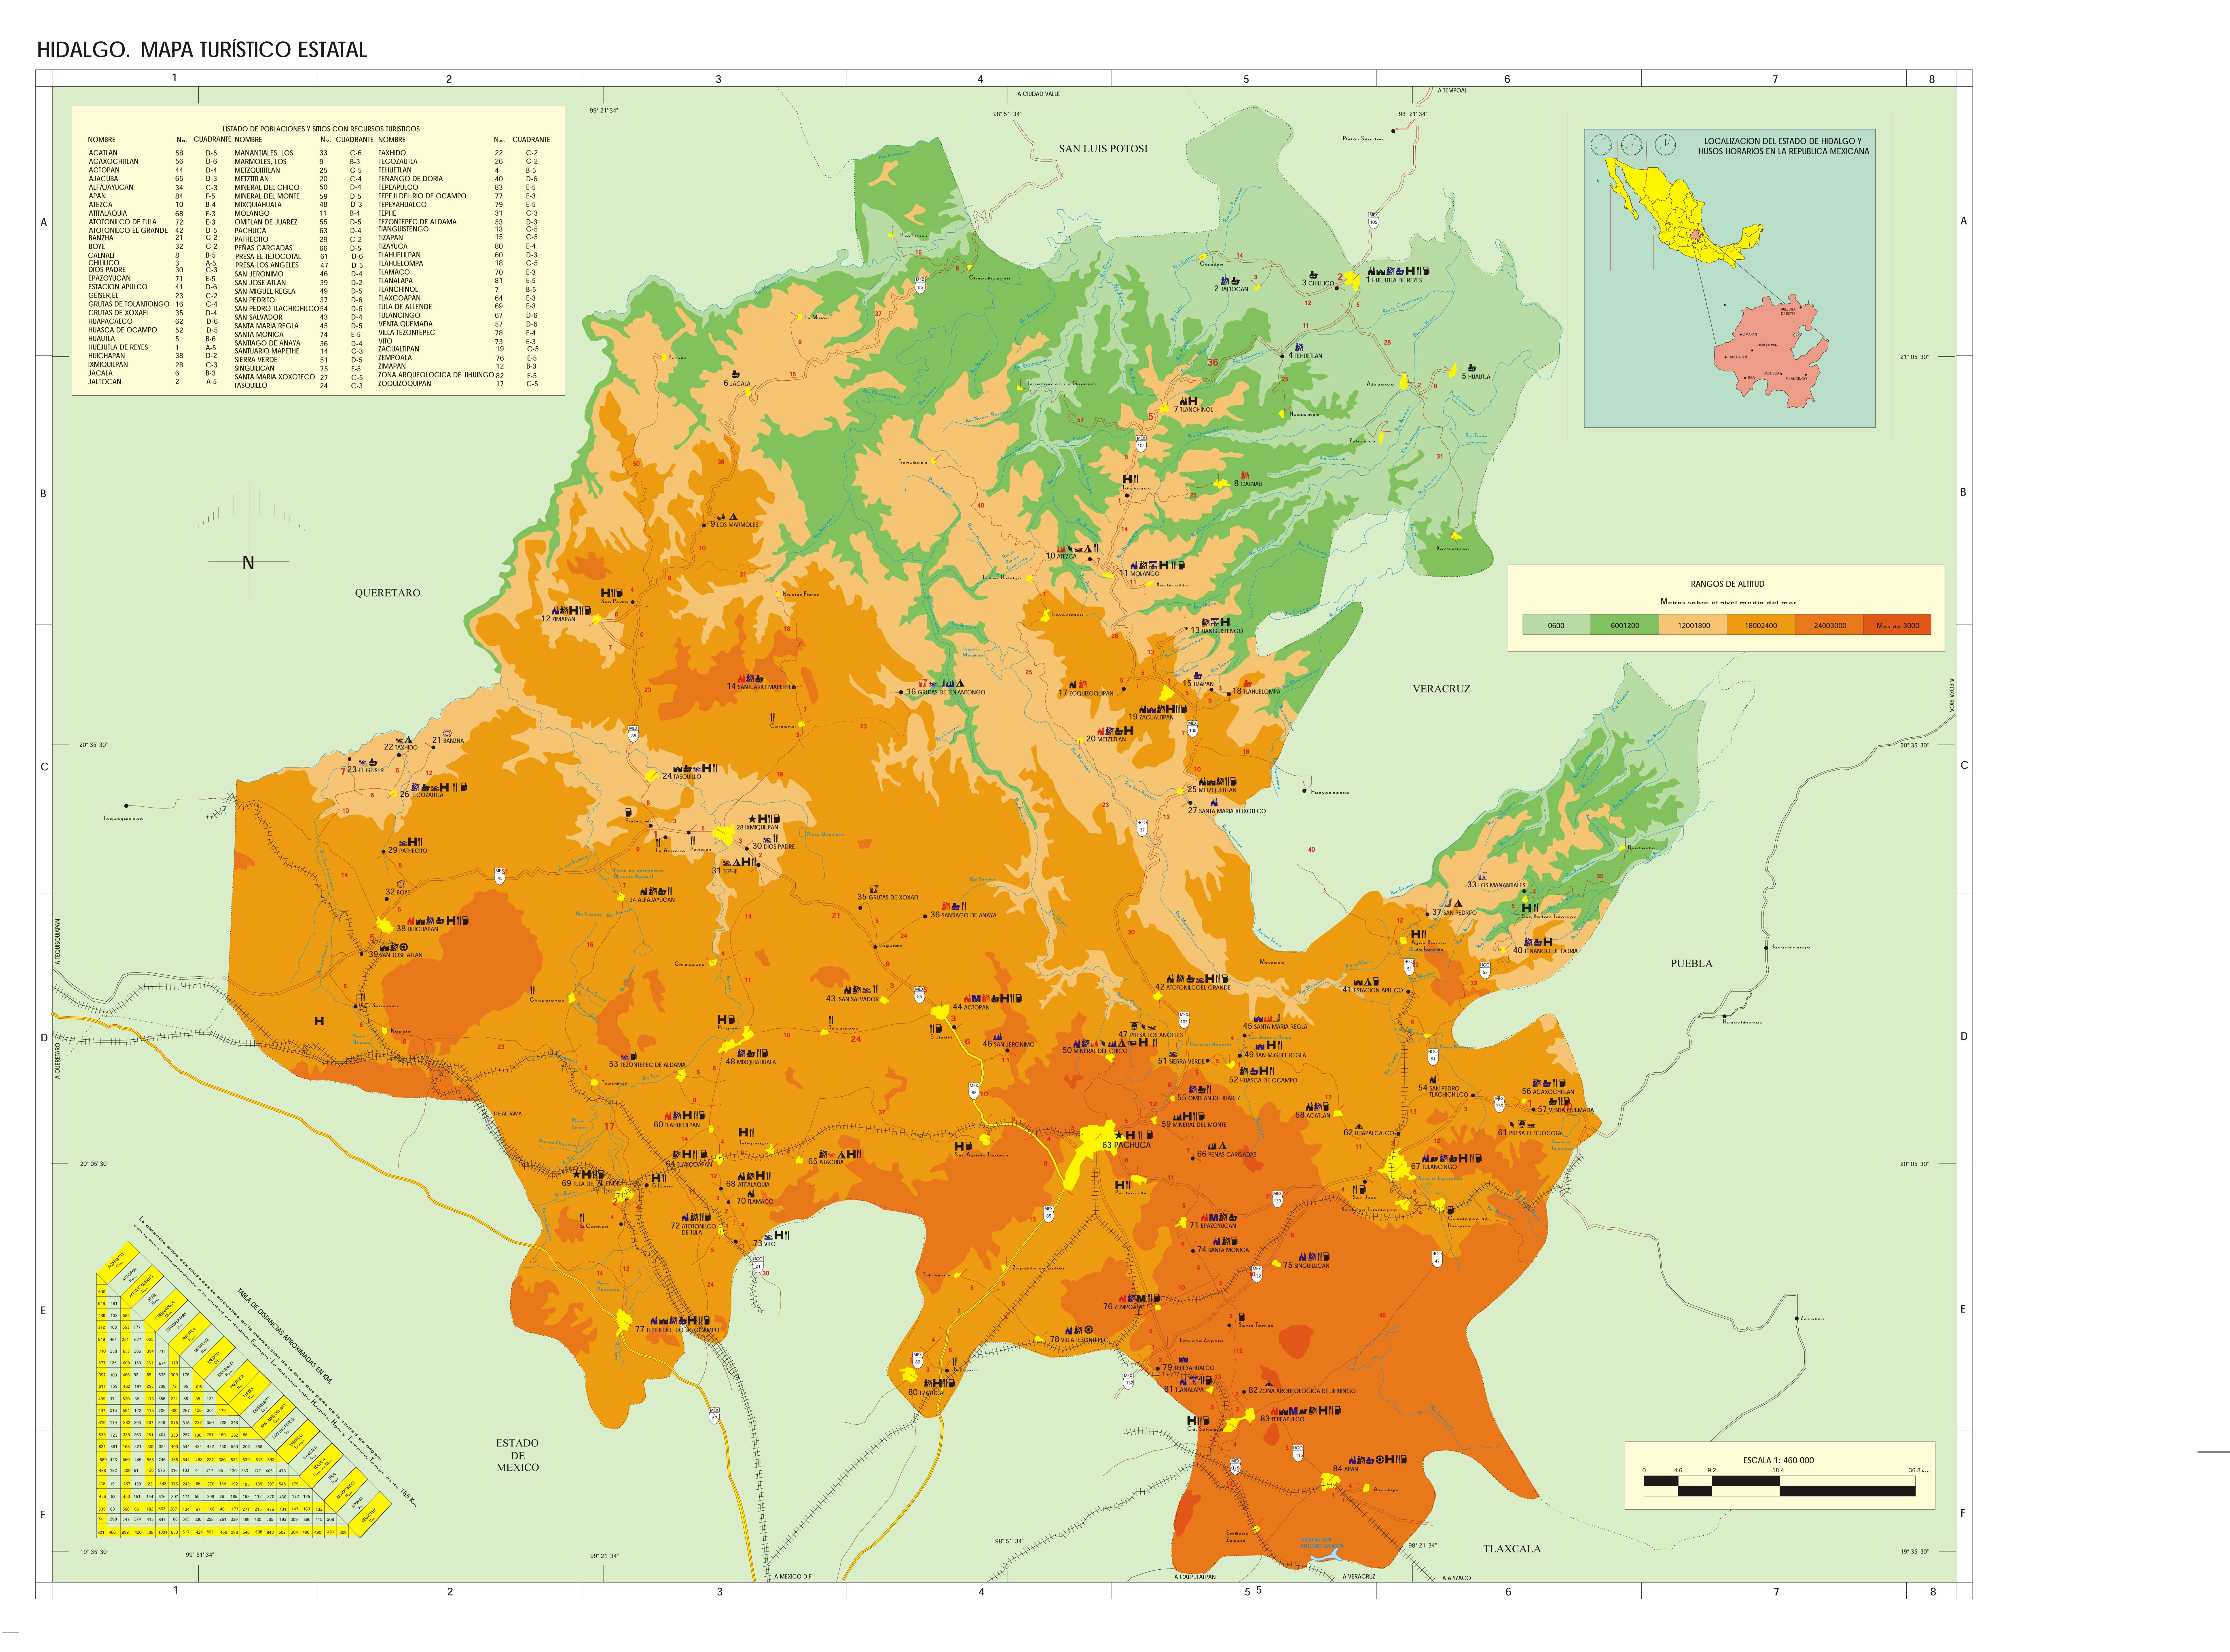 zacatecas mexico map with Mapa De Hidalgo on Pagina5 besides Union And Liberty An American Tl further Locationphotodirectlink G152772 D6555185 I142202130 Museo de la inquisicion Zacatecas central mexico and gulf coast likewise File Municipio de Rio Grande furthermore Las Fuentes Un Paraiso Para Relajarse.